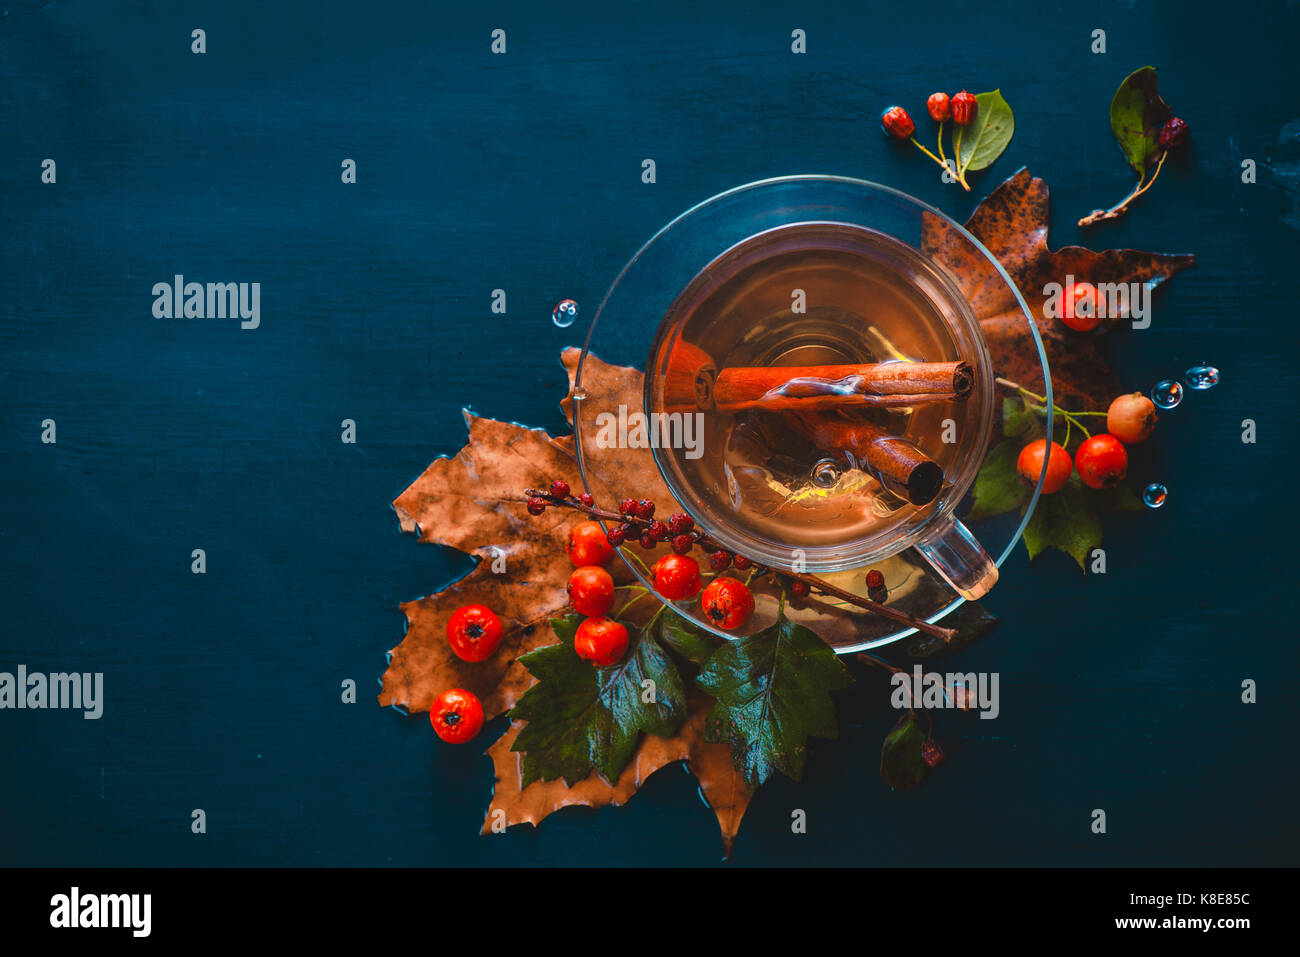 Otoño oscuro bodegón con taza de té, hojas, bayas y canela sobre un fondo húmedo. copa de té Imagen De Stock